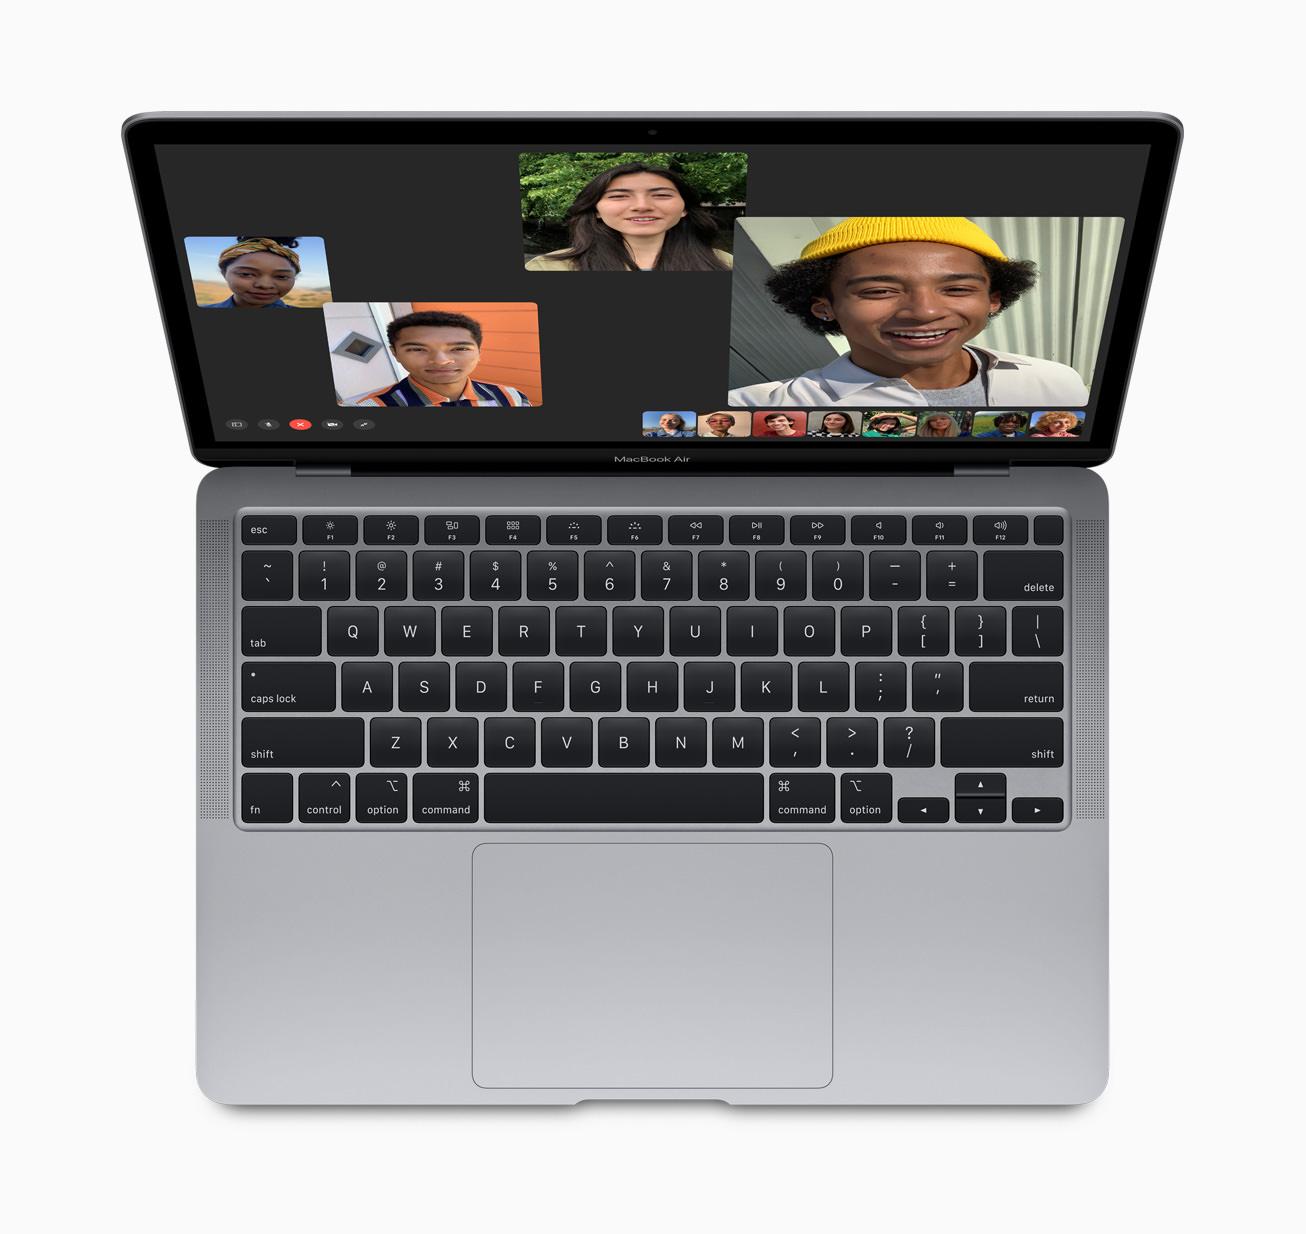 Apple_new-macbook-air-facetime-screen_03182020